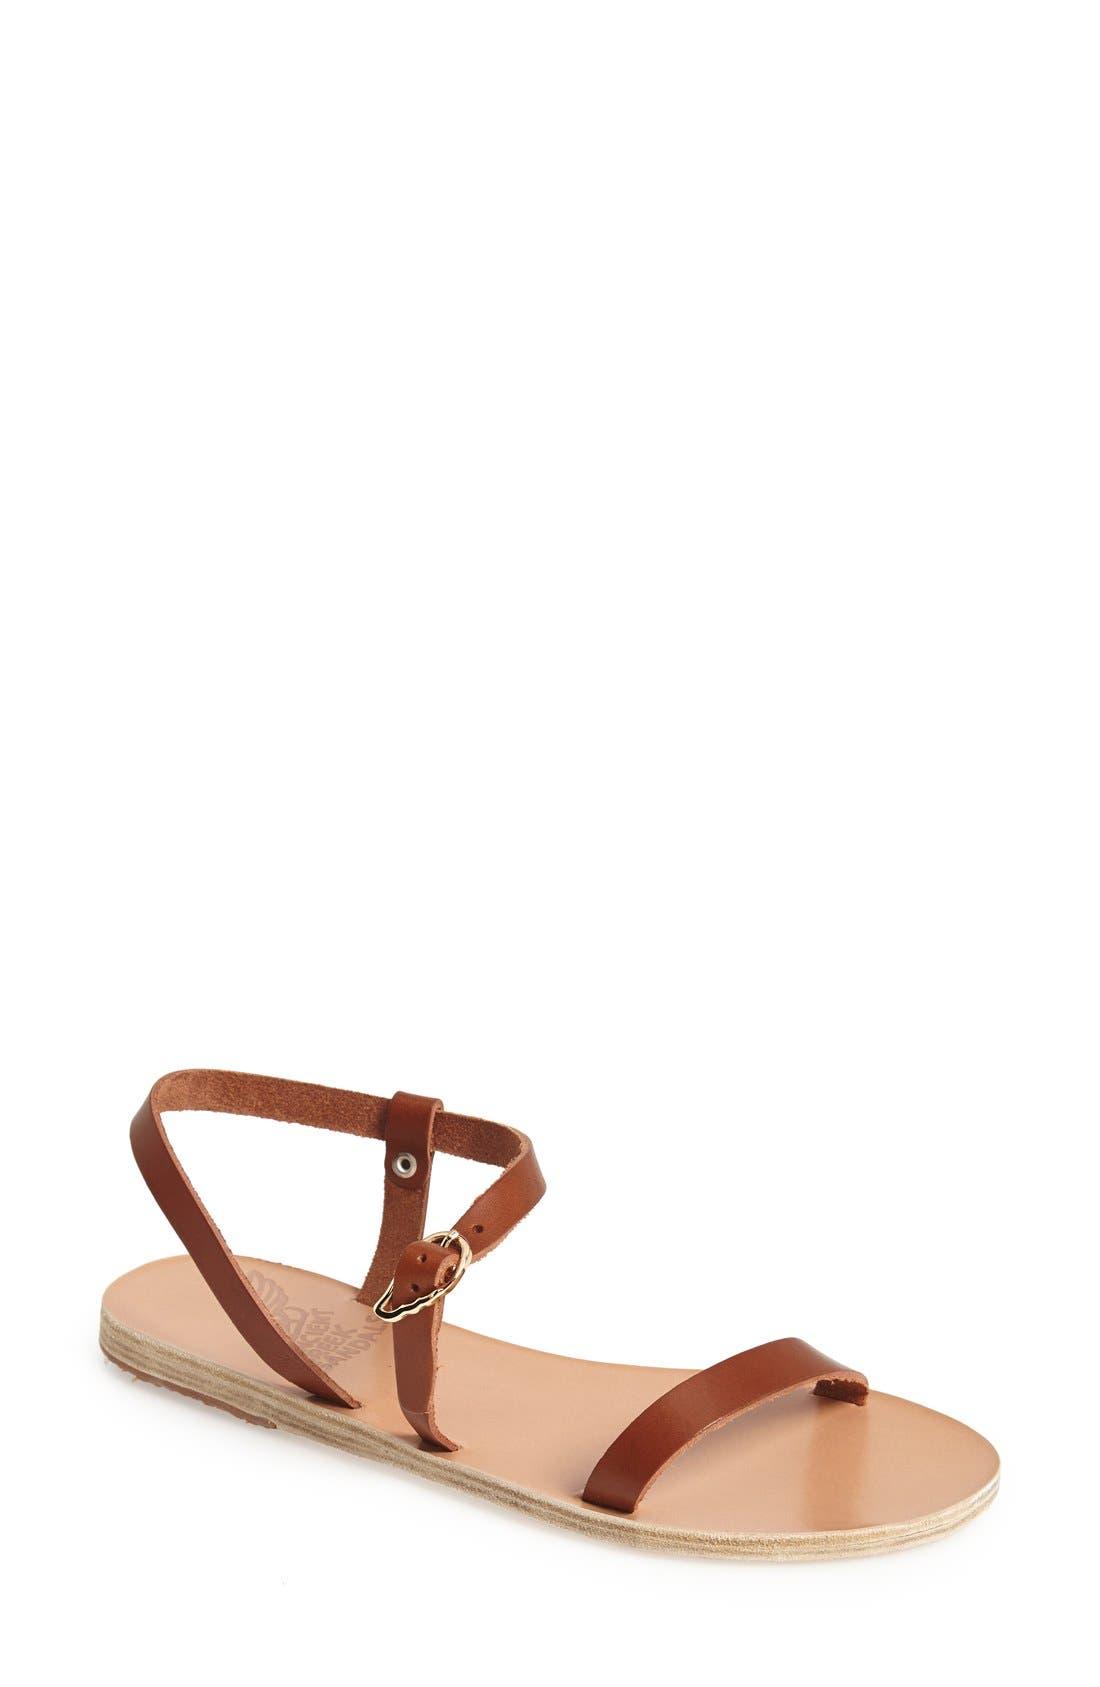 Alternate Image 1 Selected - Ancient Greek Sandals 'Niove' Leather Sandal (Women)